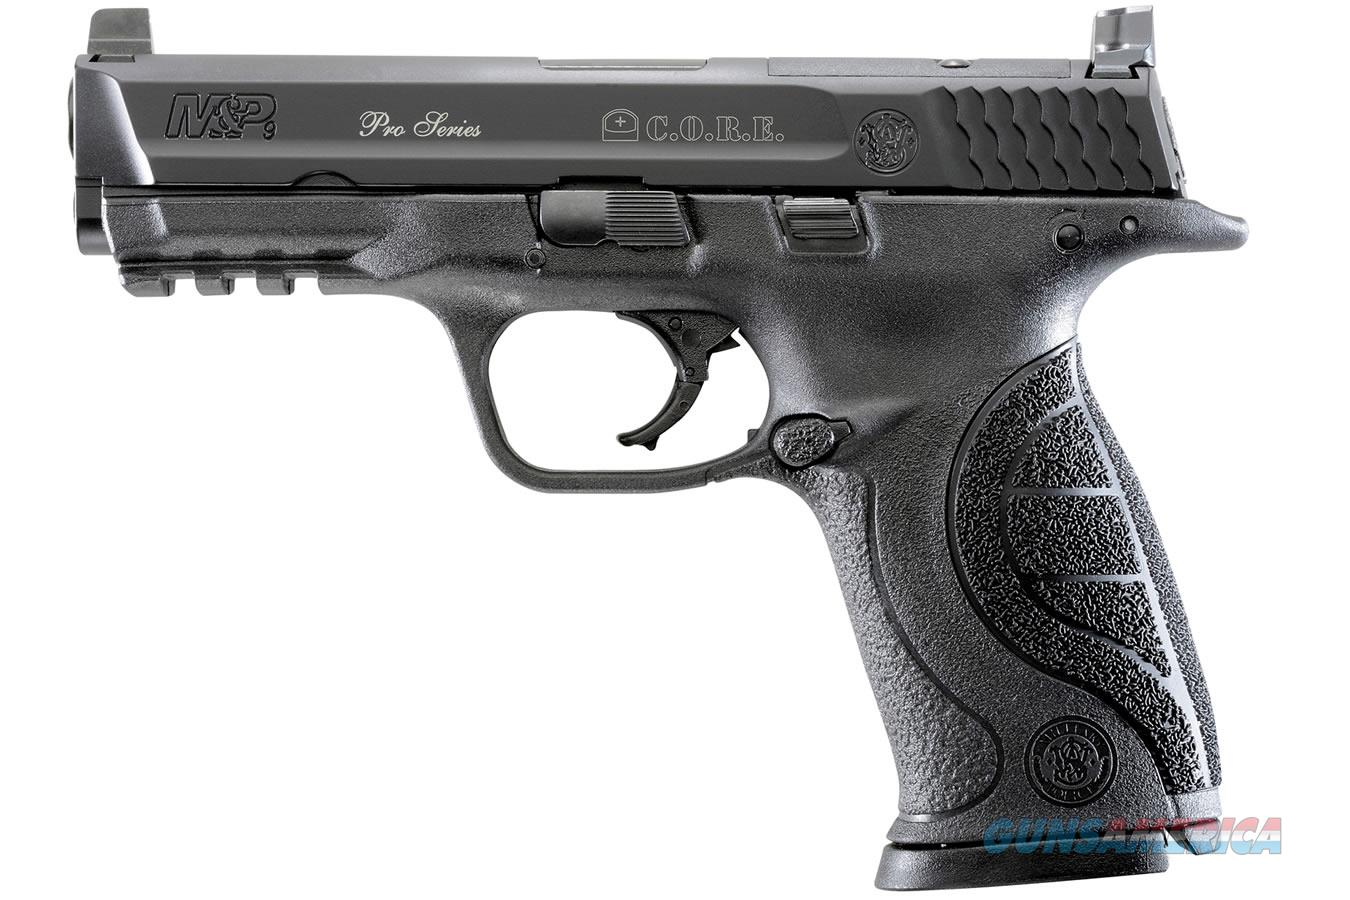 Smith & Wesson M&P9 Pro Series C.O.R.E 9mm 178061  Guns > Pistols > Smith & Wesson Pistols - Autos > Polymer Frame